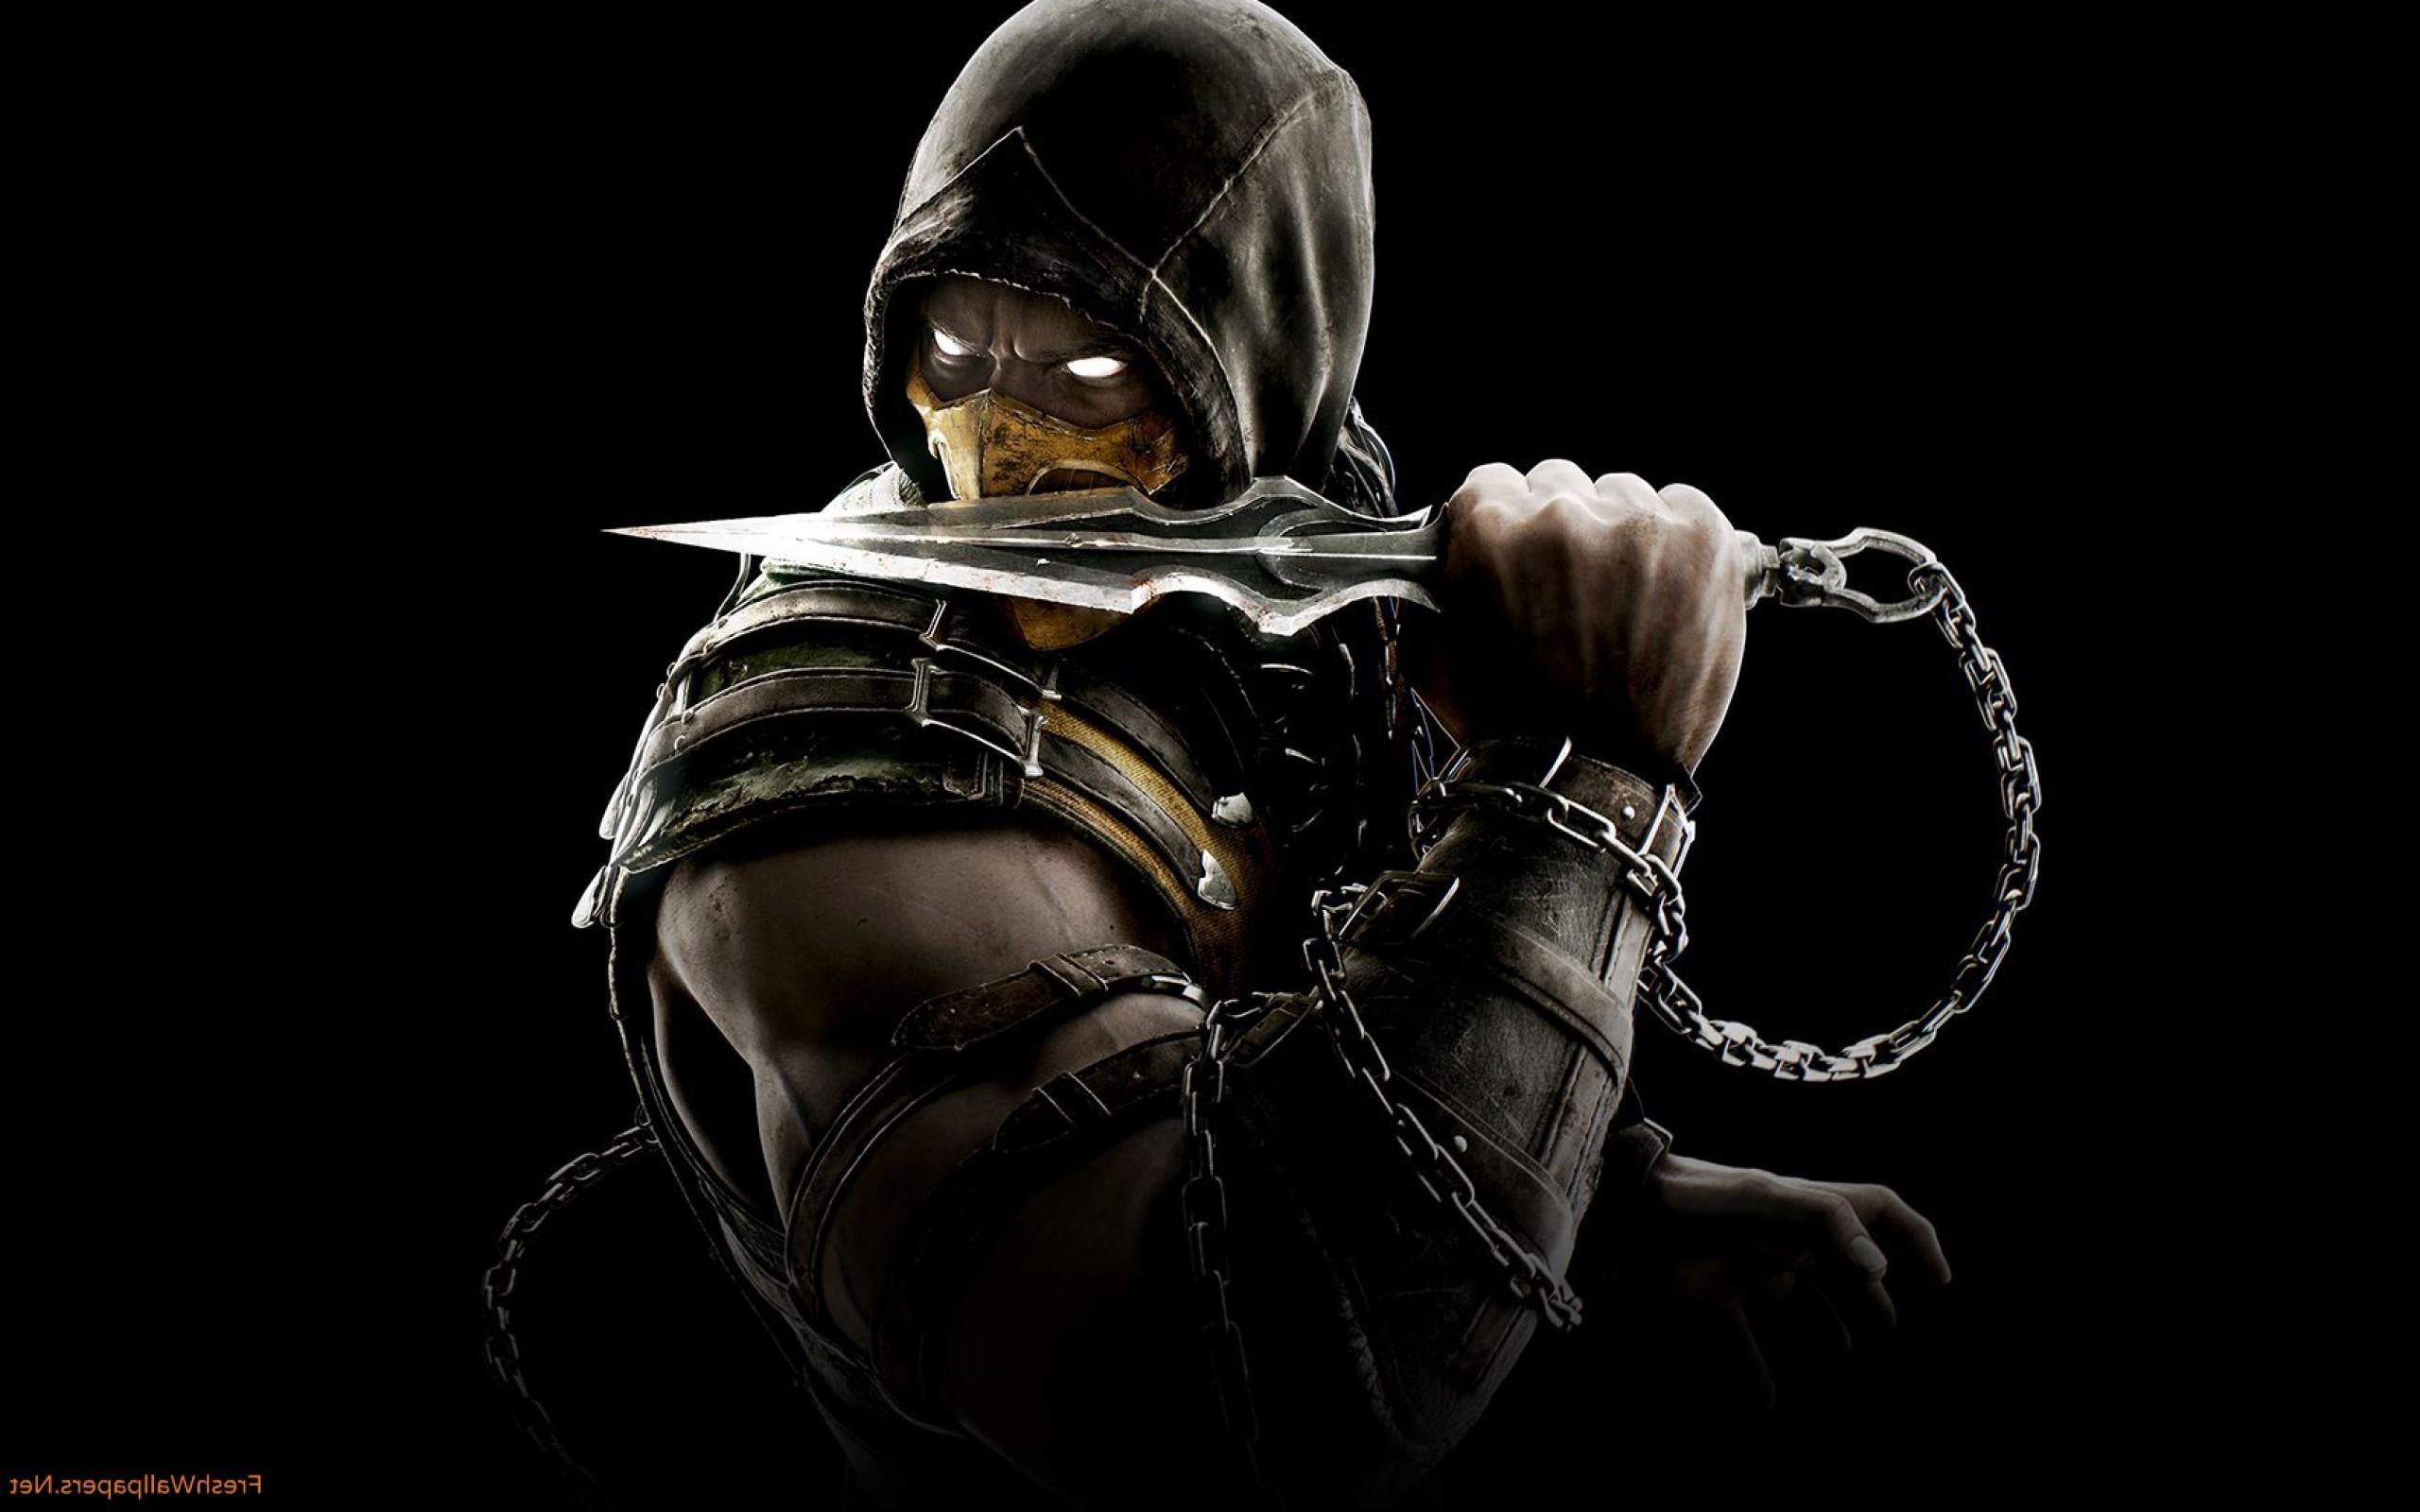 2560x1600 Px Chains Hoods Mortal Kombat X Scorpion Character Video Games